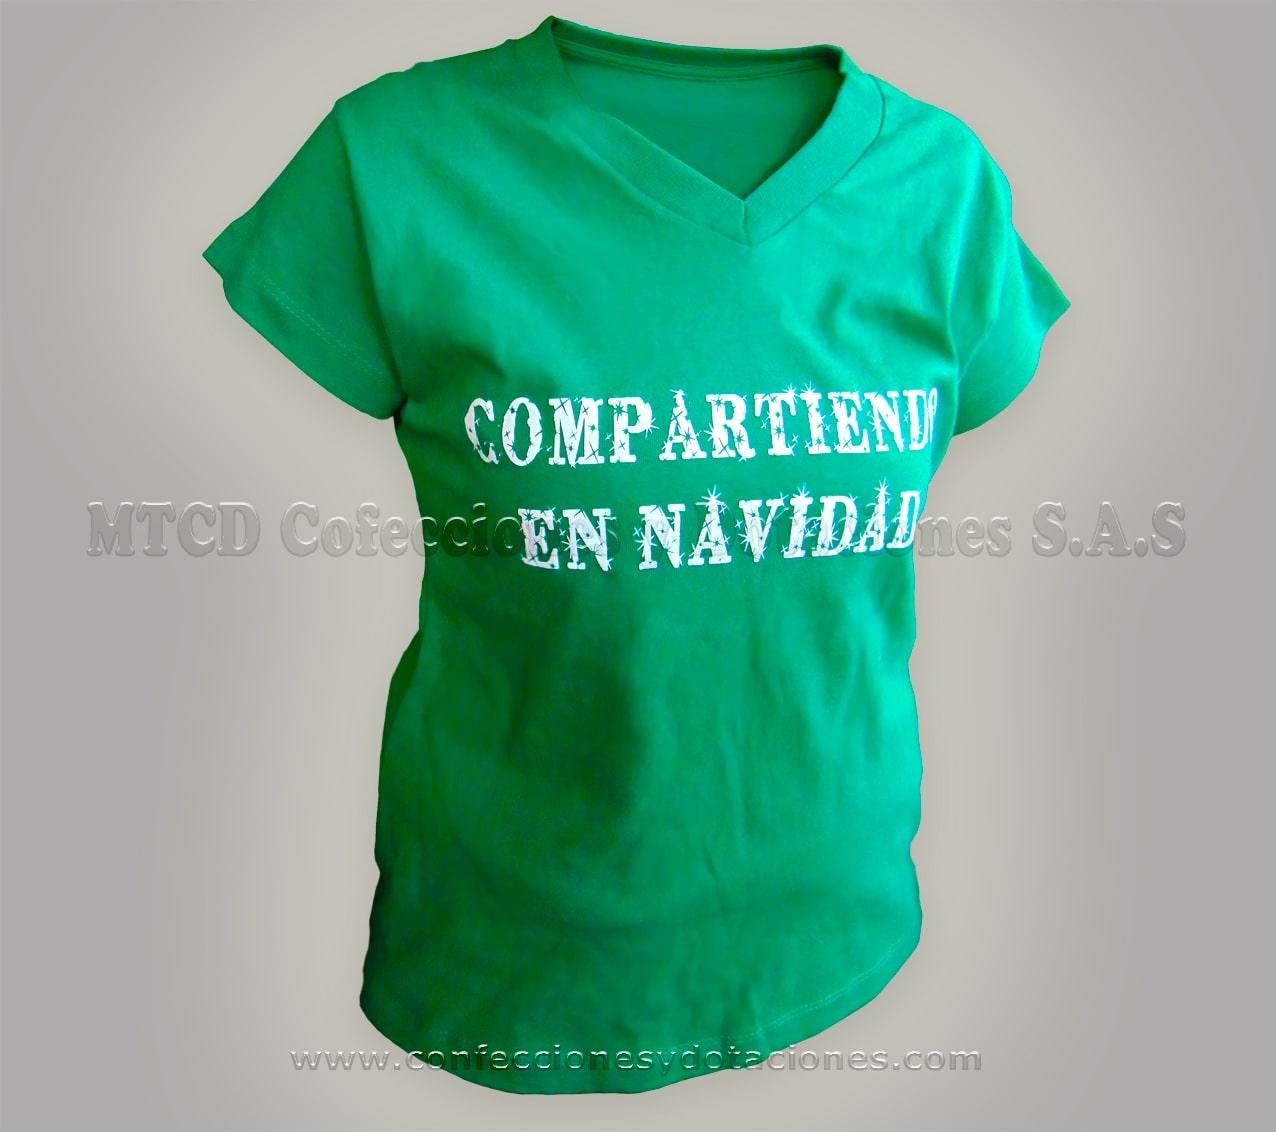 Camisetas estampadas económicas